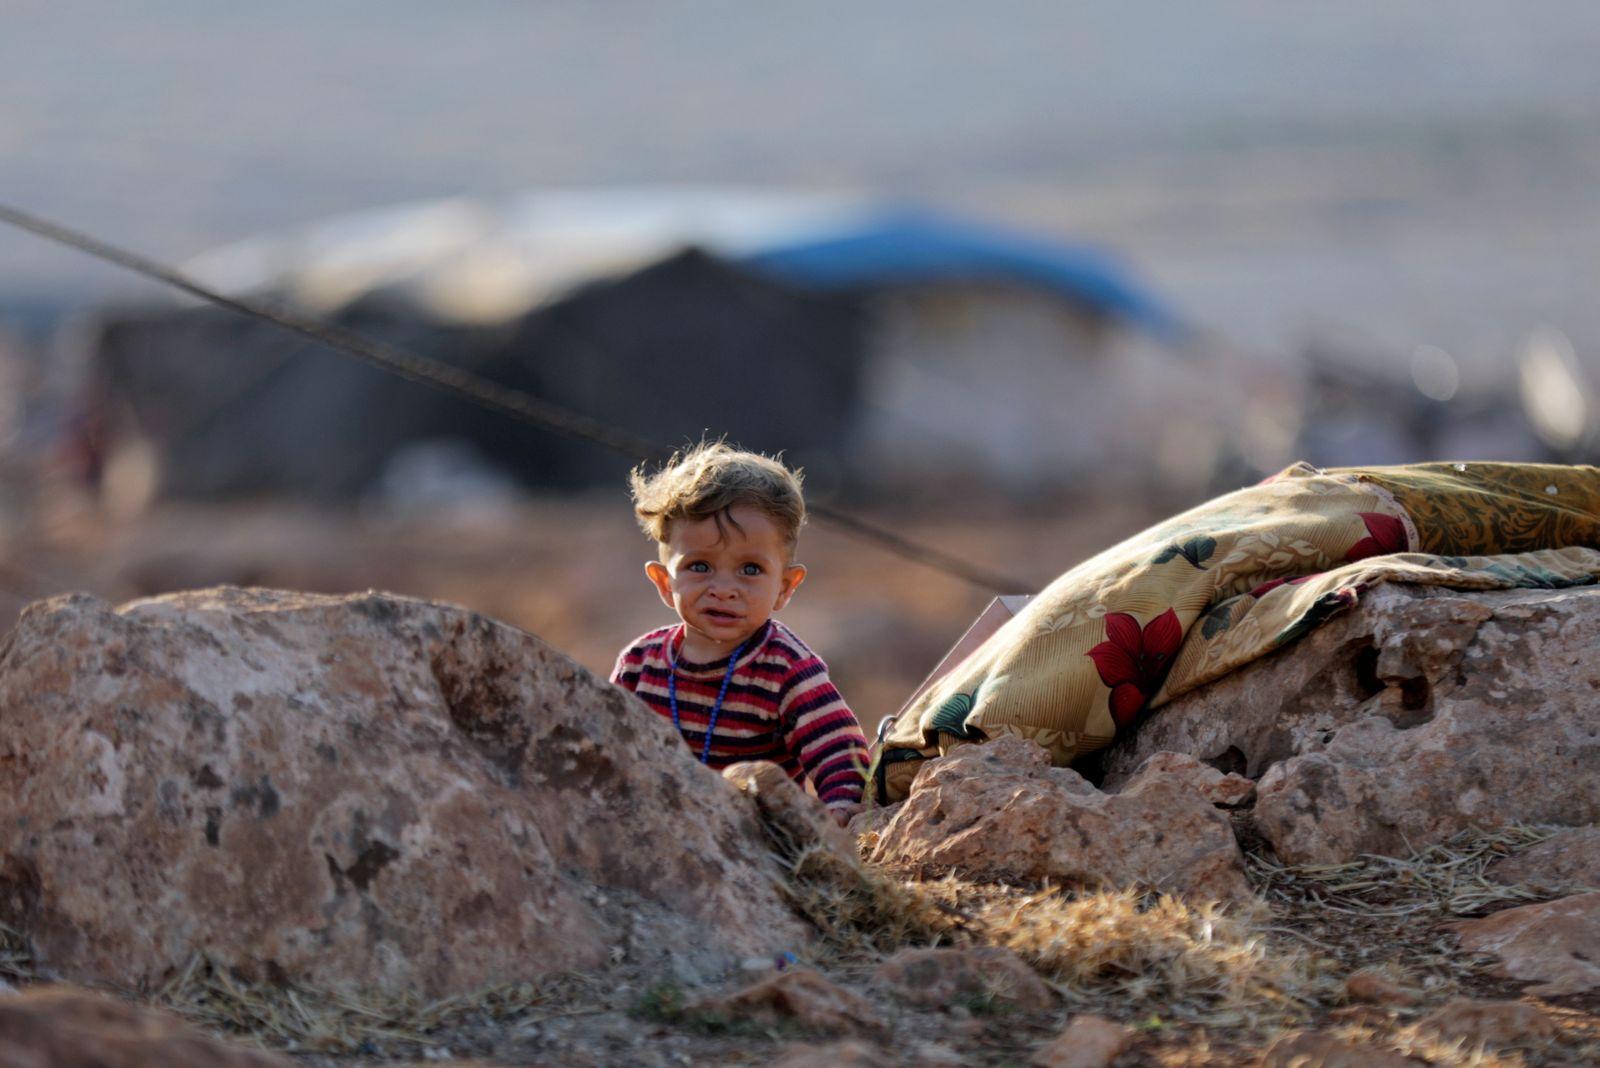 A newly displaced Syrian child walks near a refugee camp in Atimah village, Idlib province